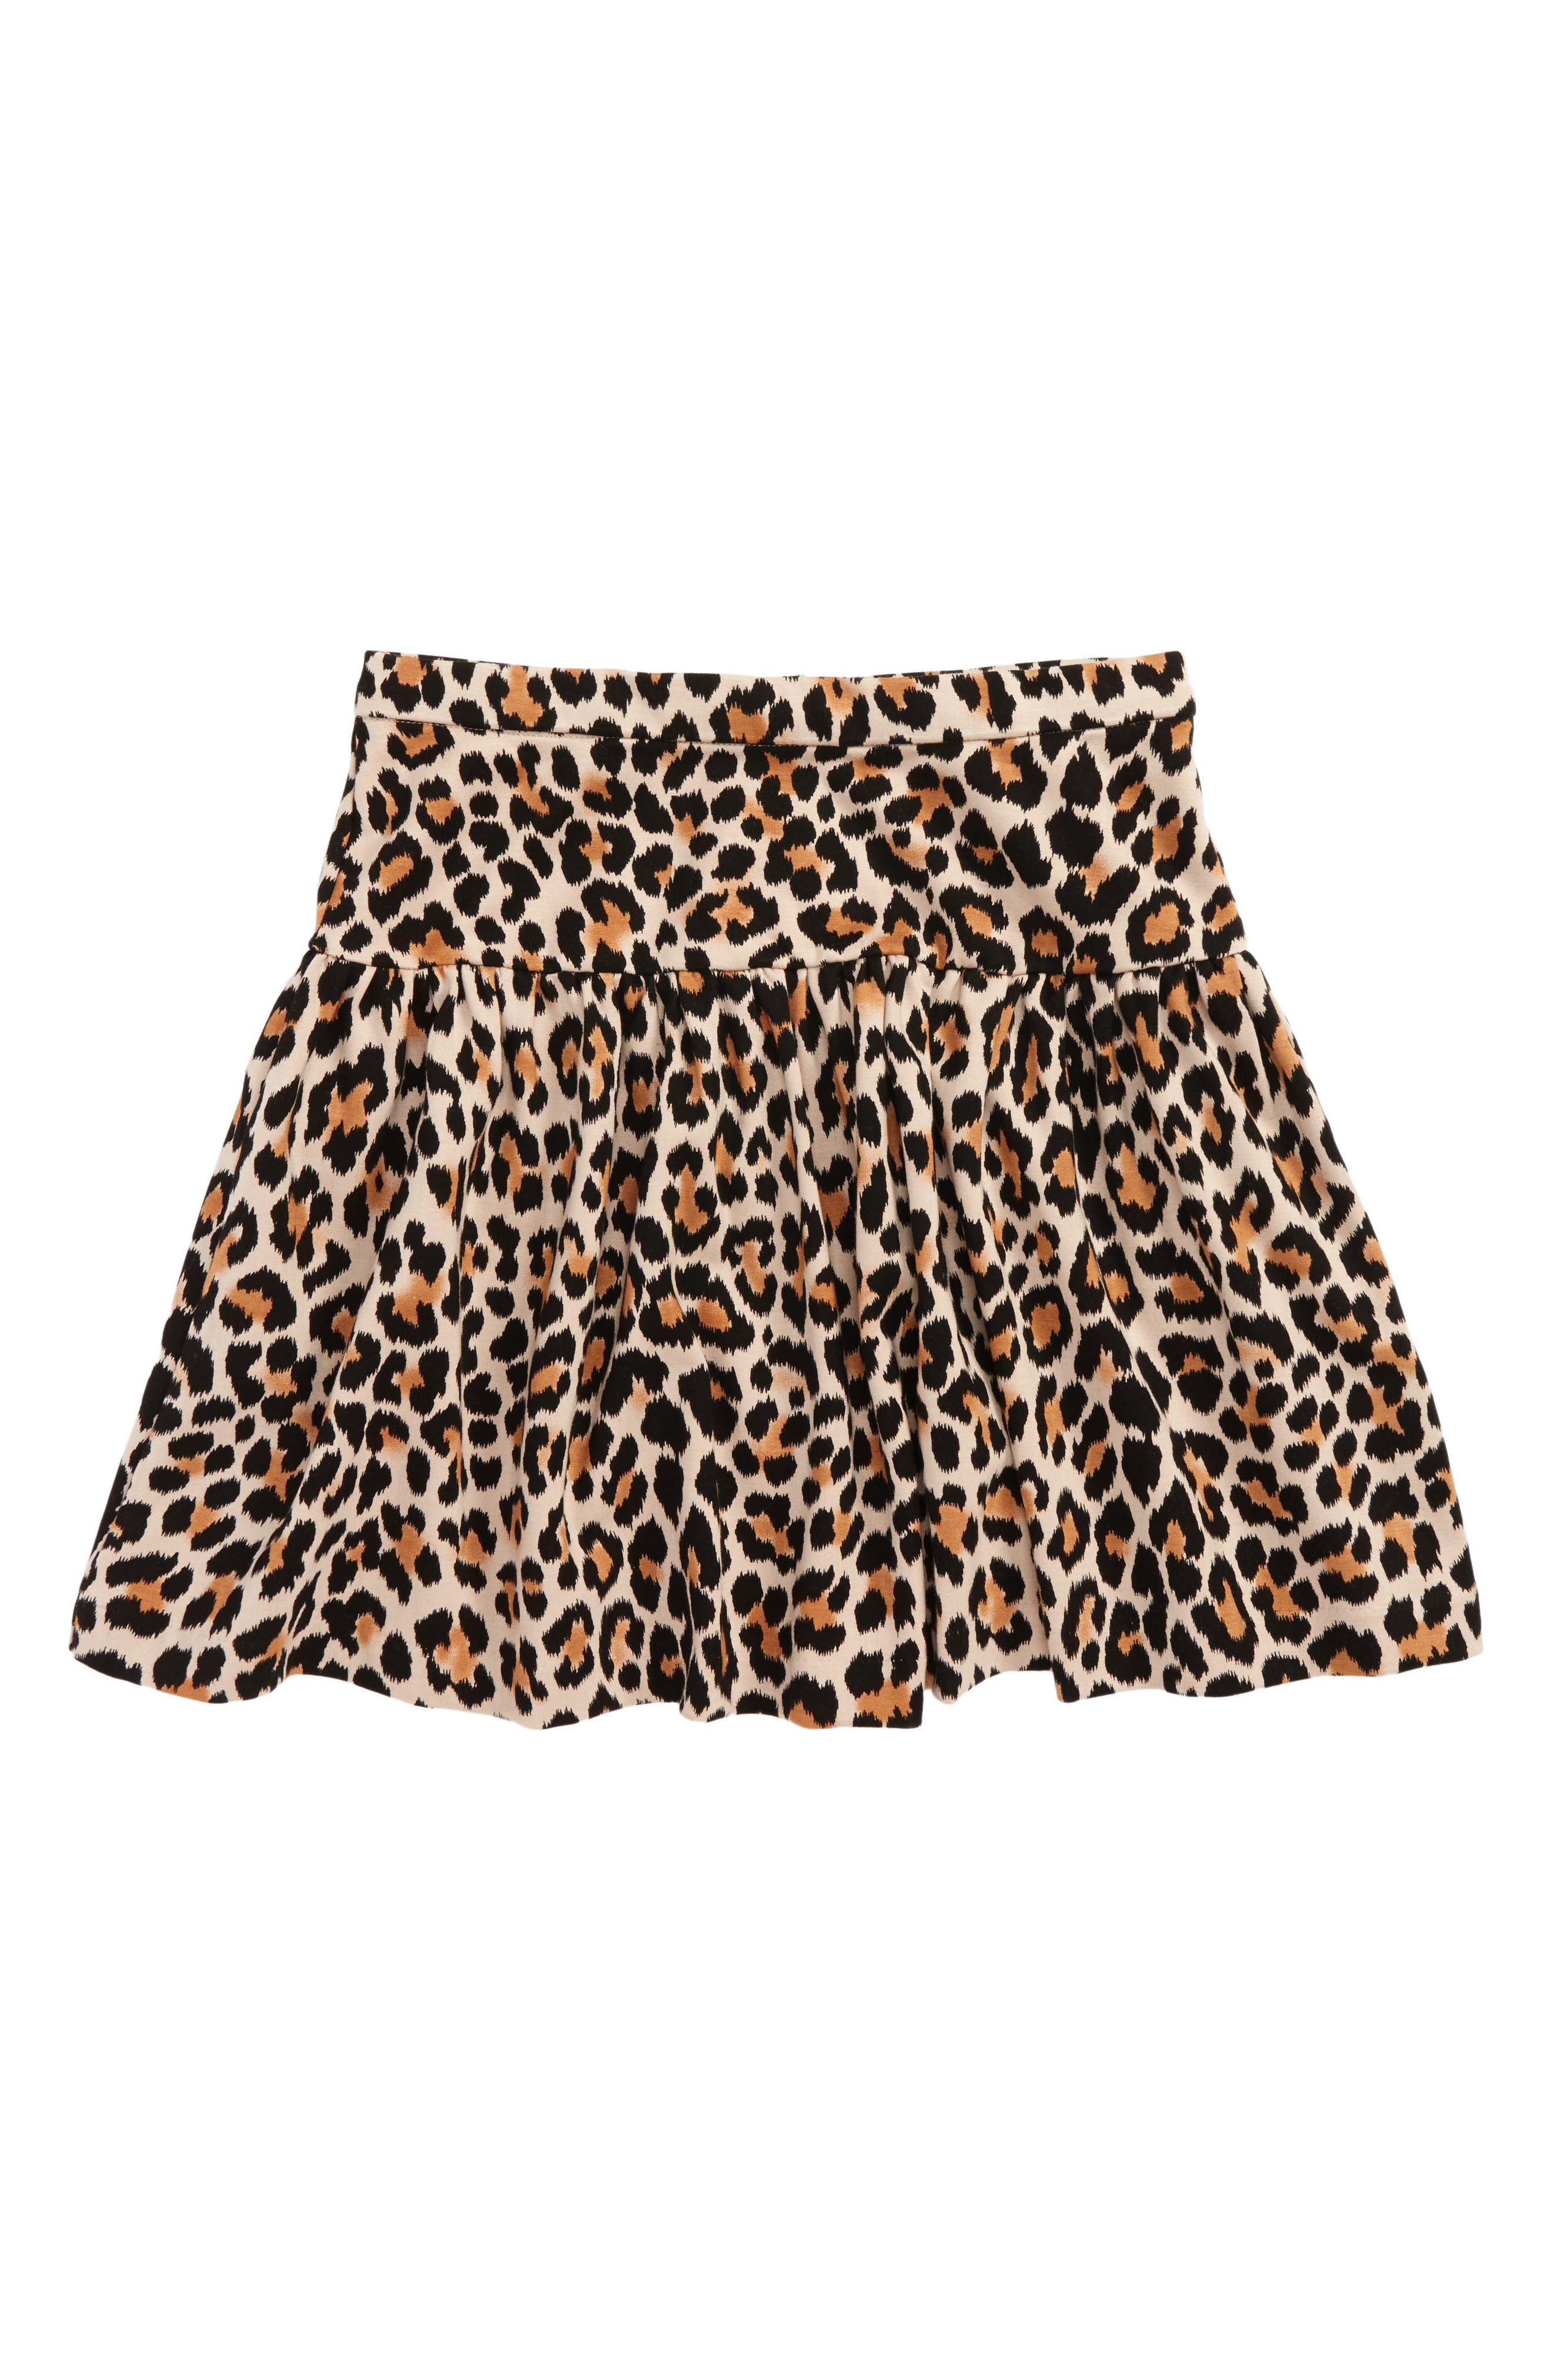 leopard print skirt,                             Main thumbnail 1, color,